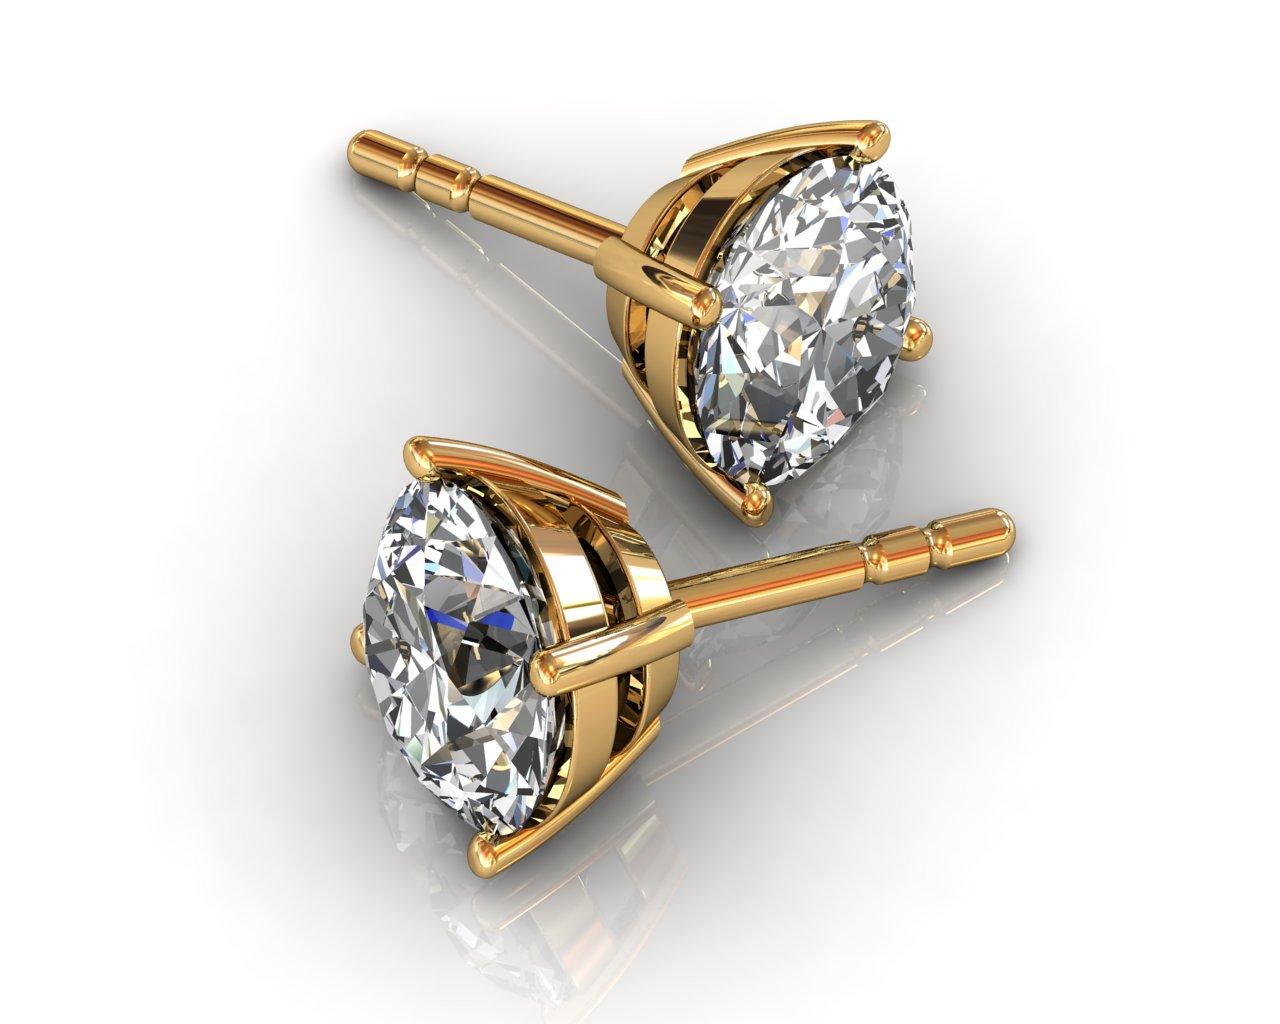 diamond stud earrings in yellow gold